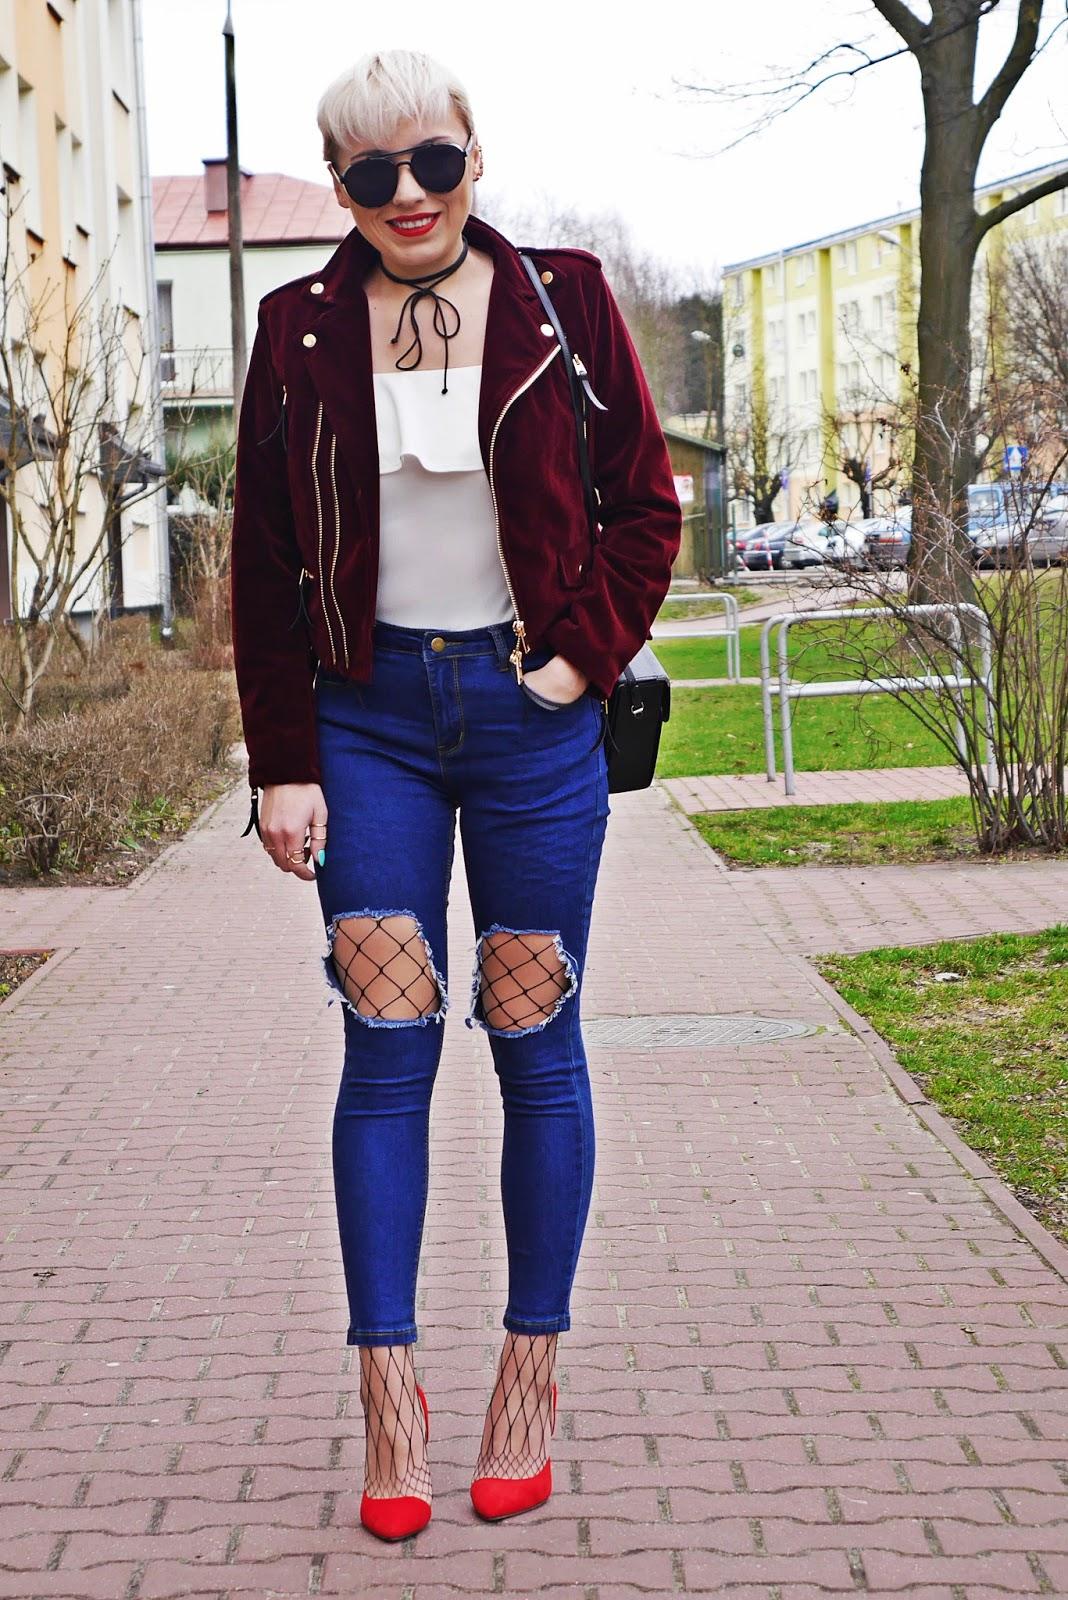 velvet_biker_jacket_burgundy_zaful_karyn_look_ootd_outfit_300317c